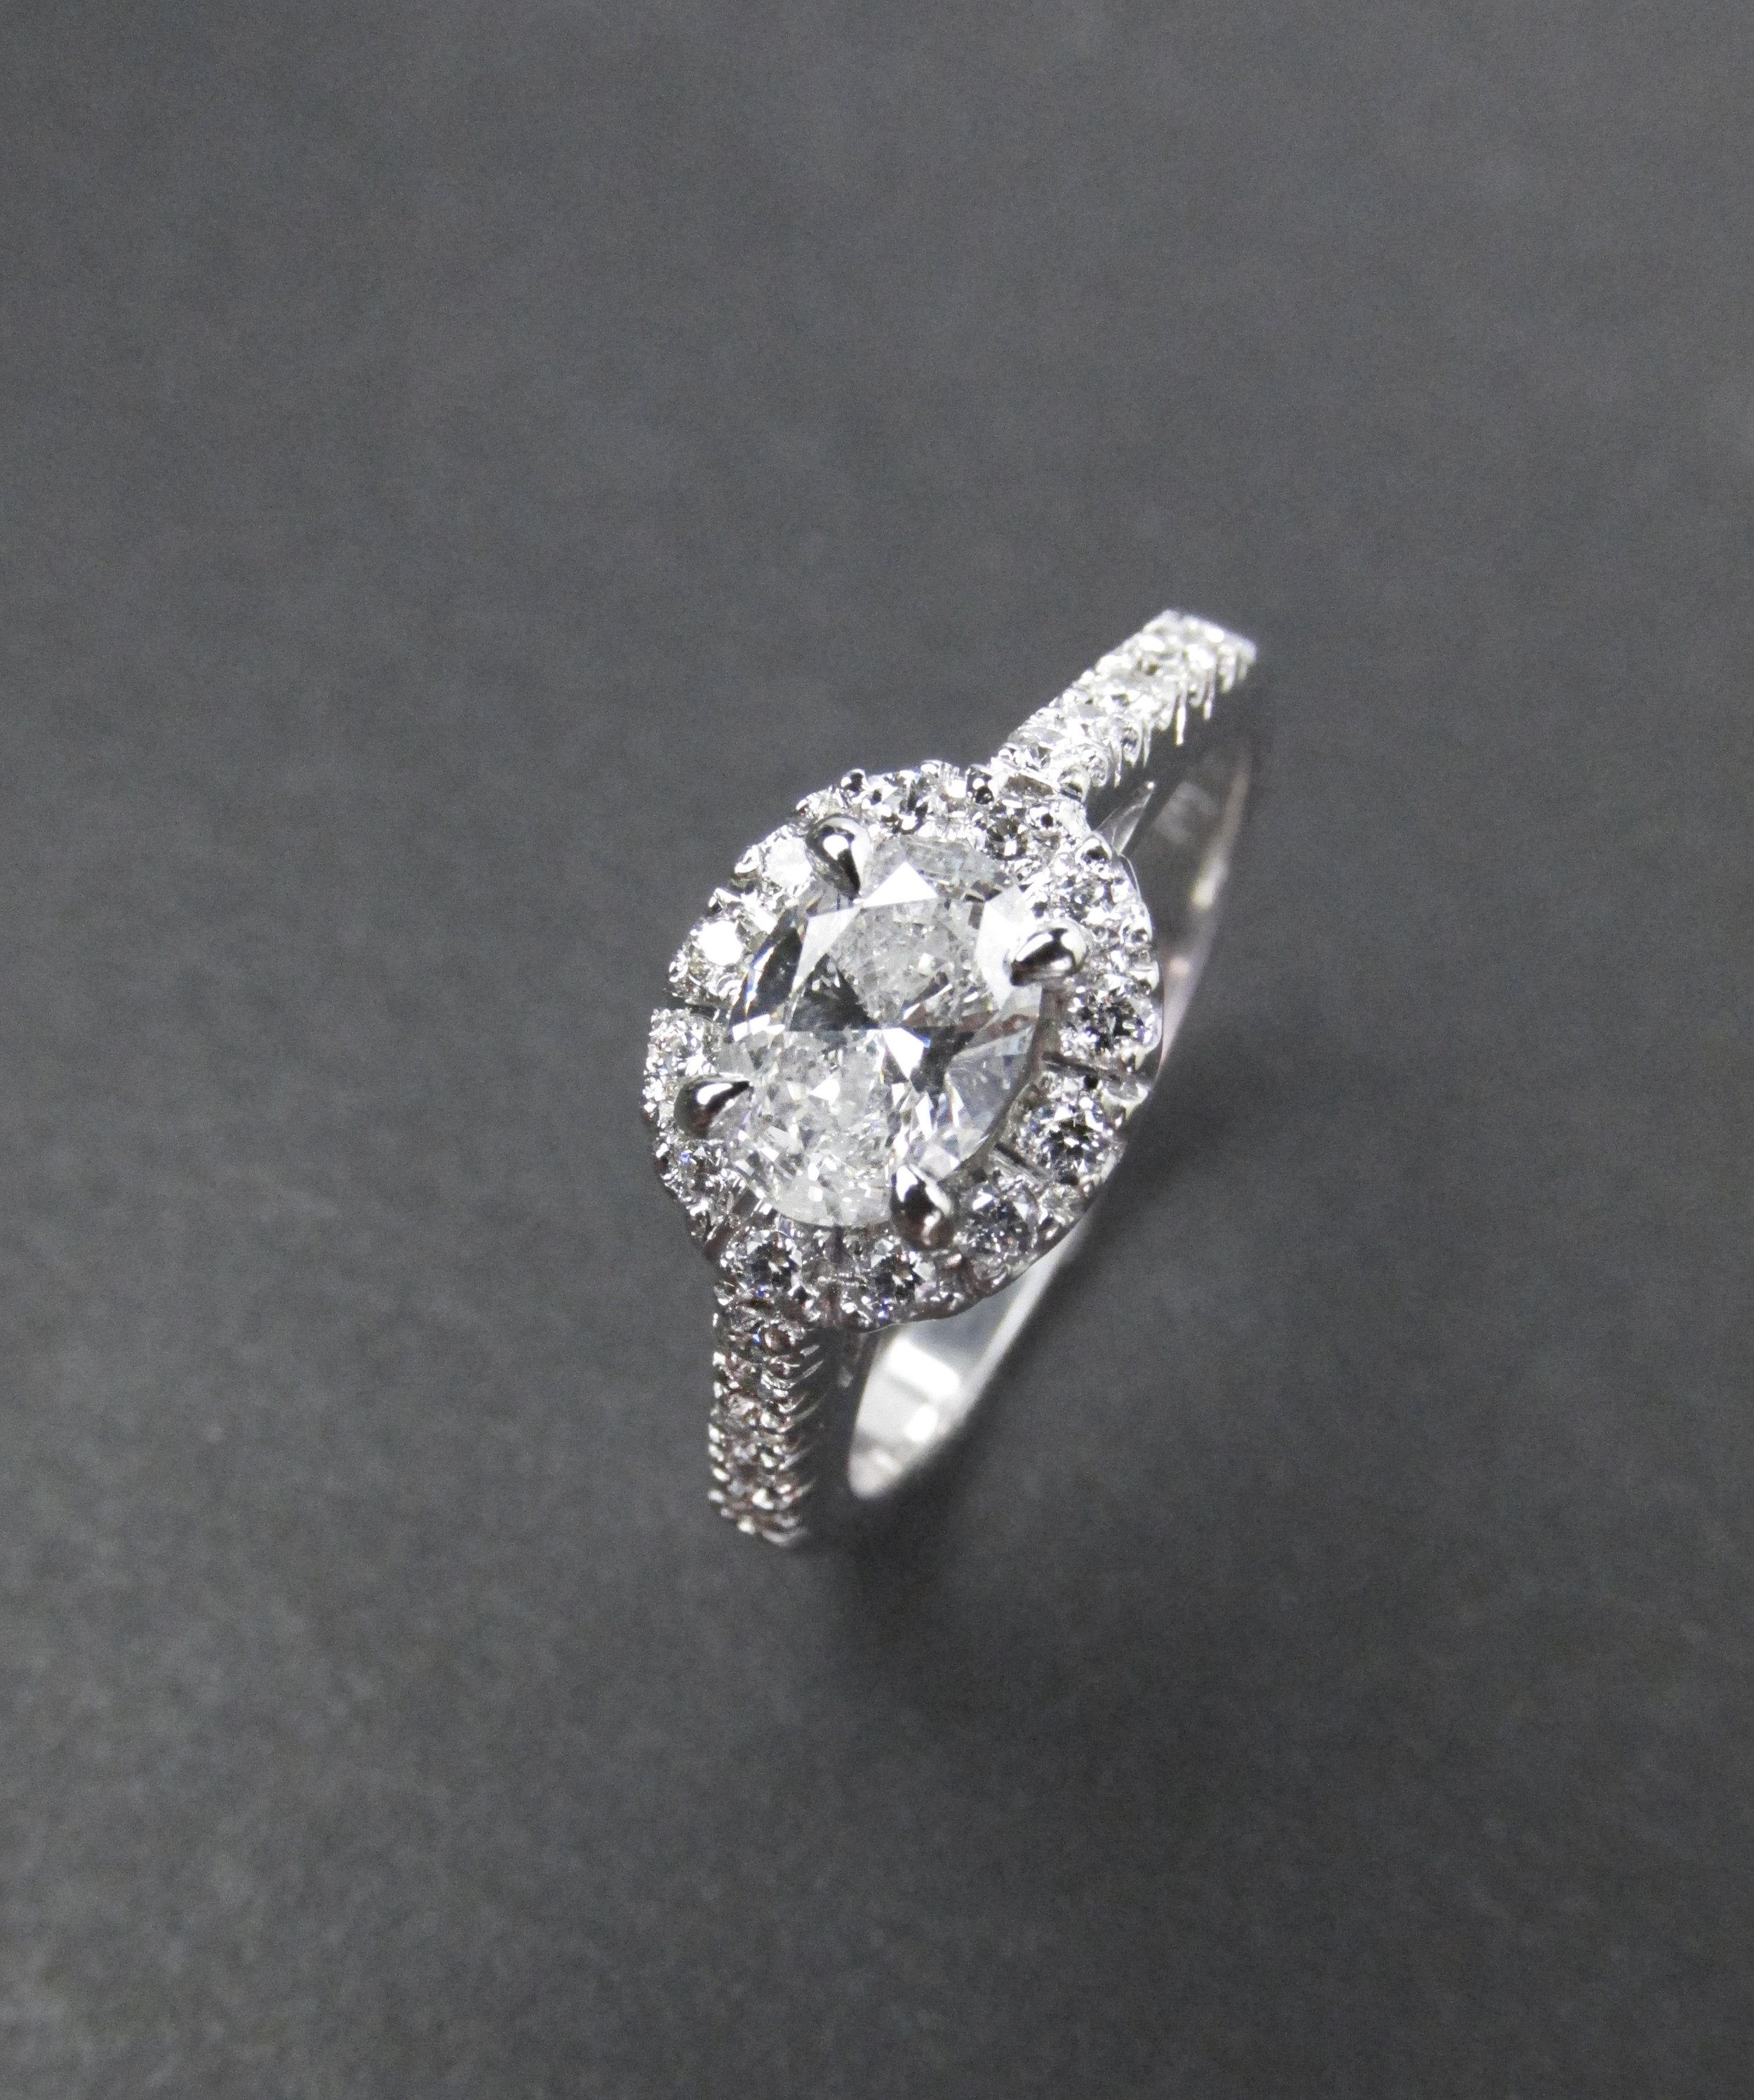 sideways_oval_engagement_ring_redford_jewelers.jpg